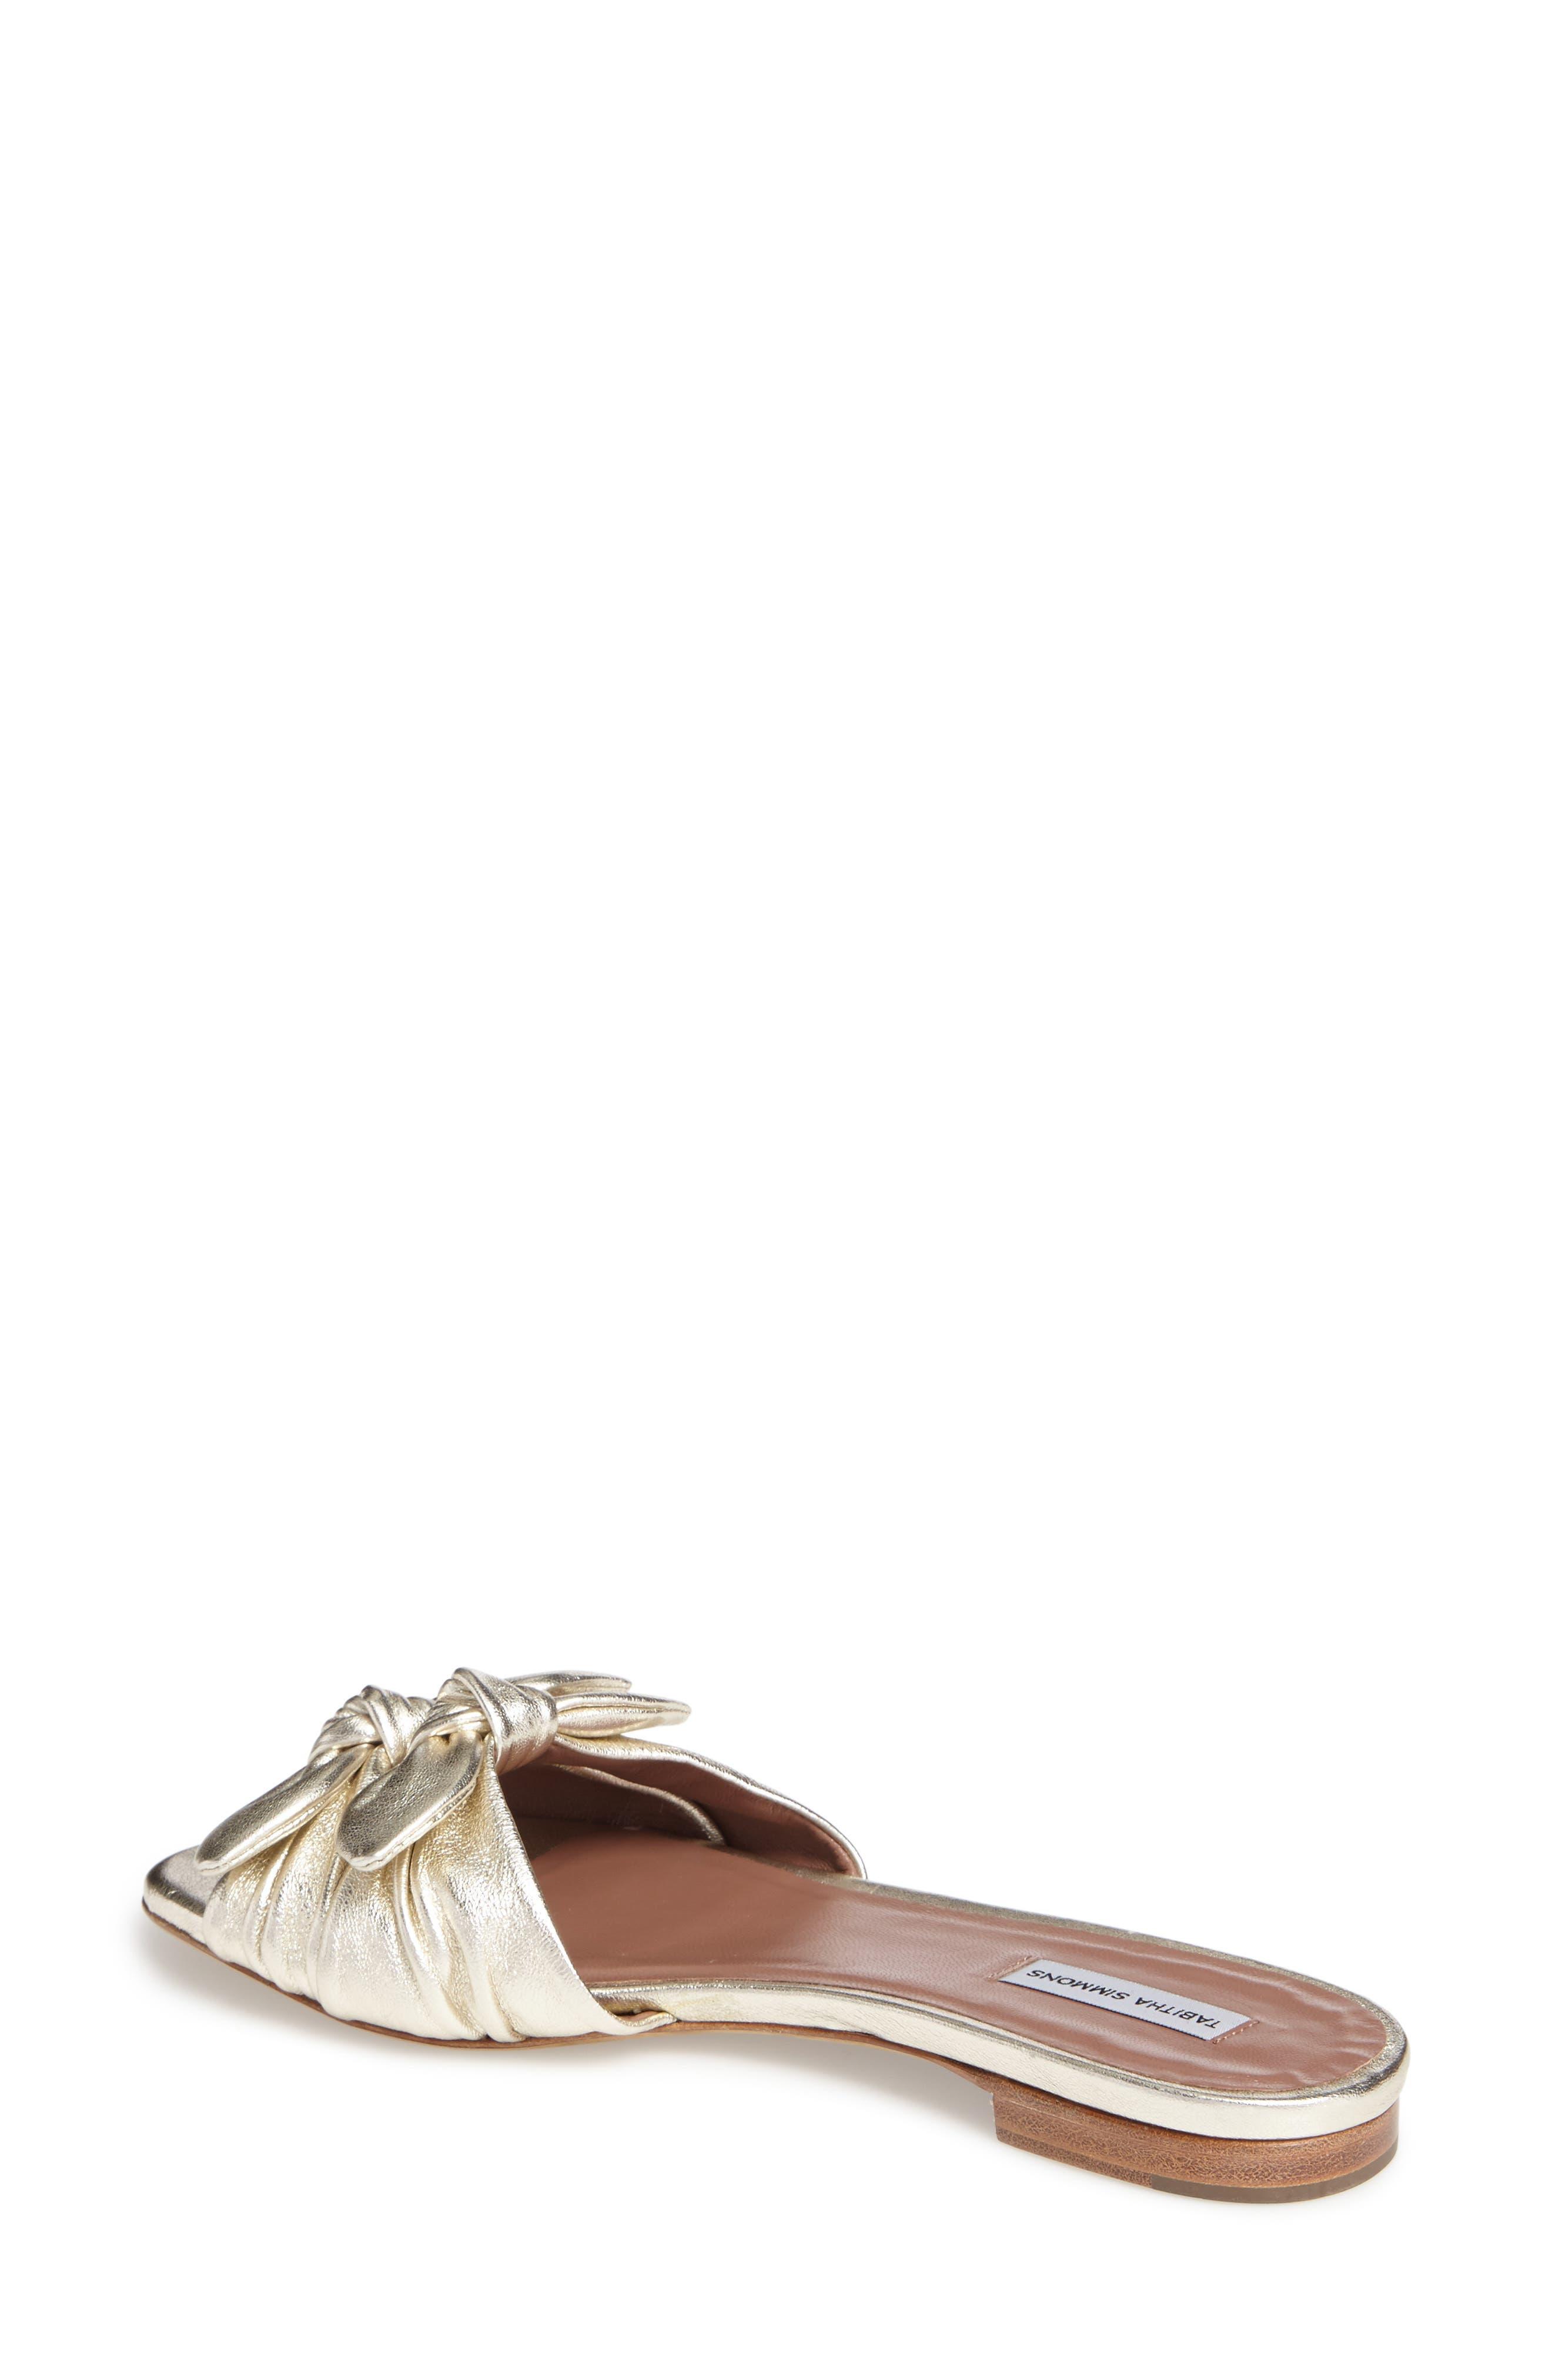 Cleo Knotted Bow Slide Sandal,                             Alternate thumbnail 2, color,                             040